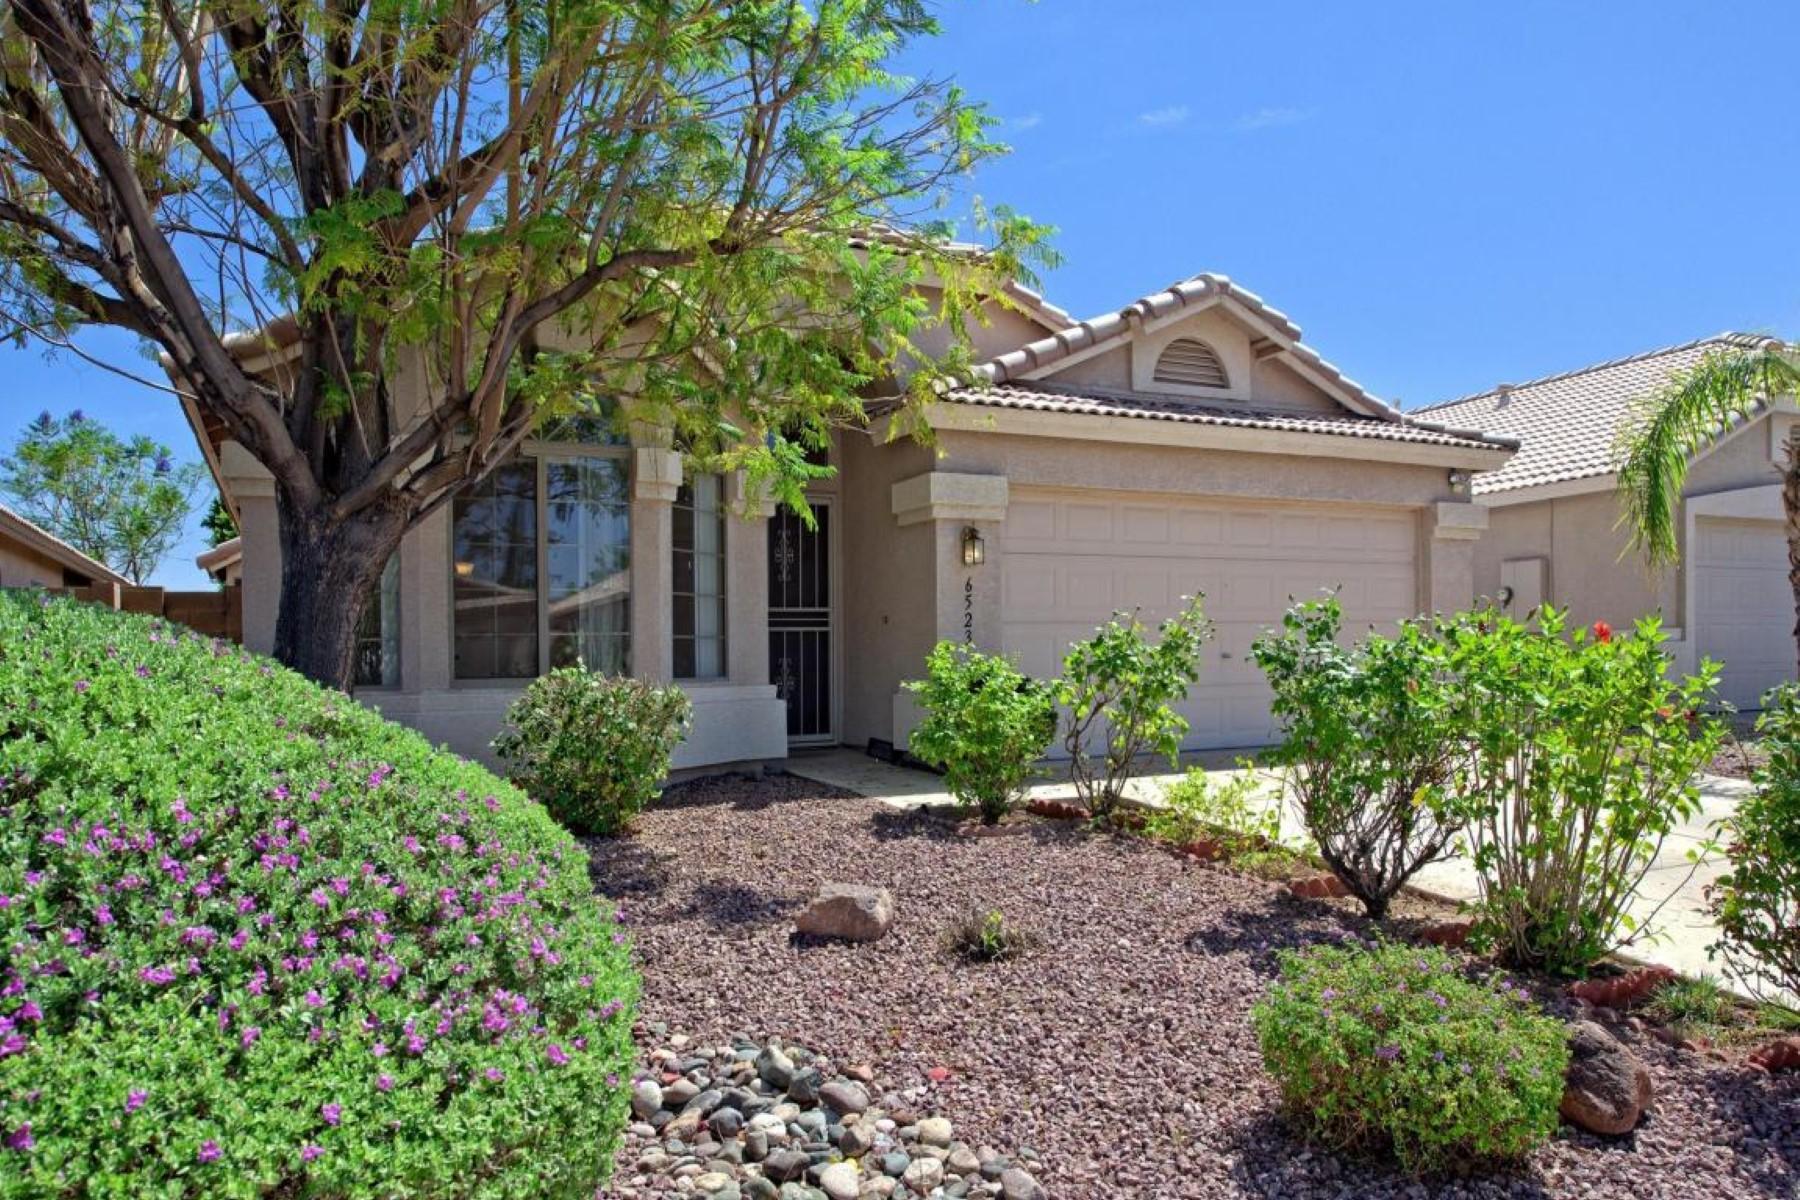 独户住宅 为 销售 在 Charming home in the desirable neighborhood of Entrada 6523 W Saddlehorn Rd 菲尼克斯(凤凰城), 亚利桑那州, 85083 美国